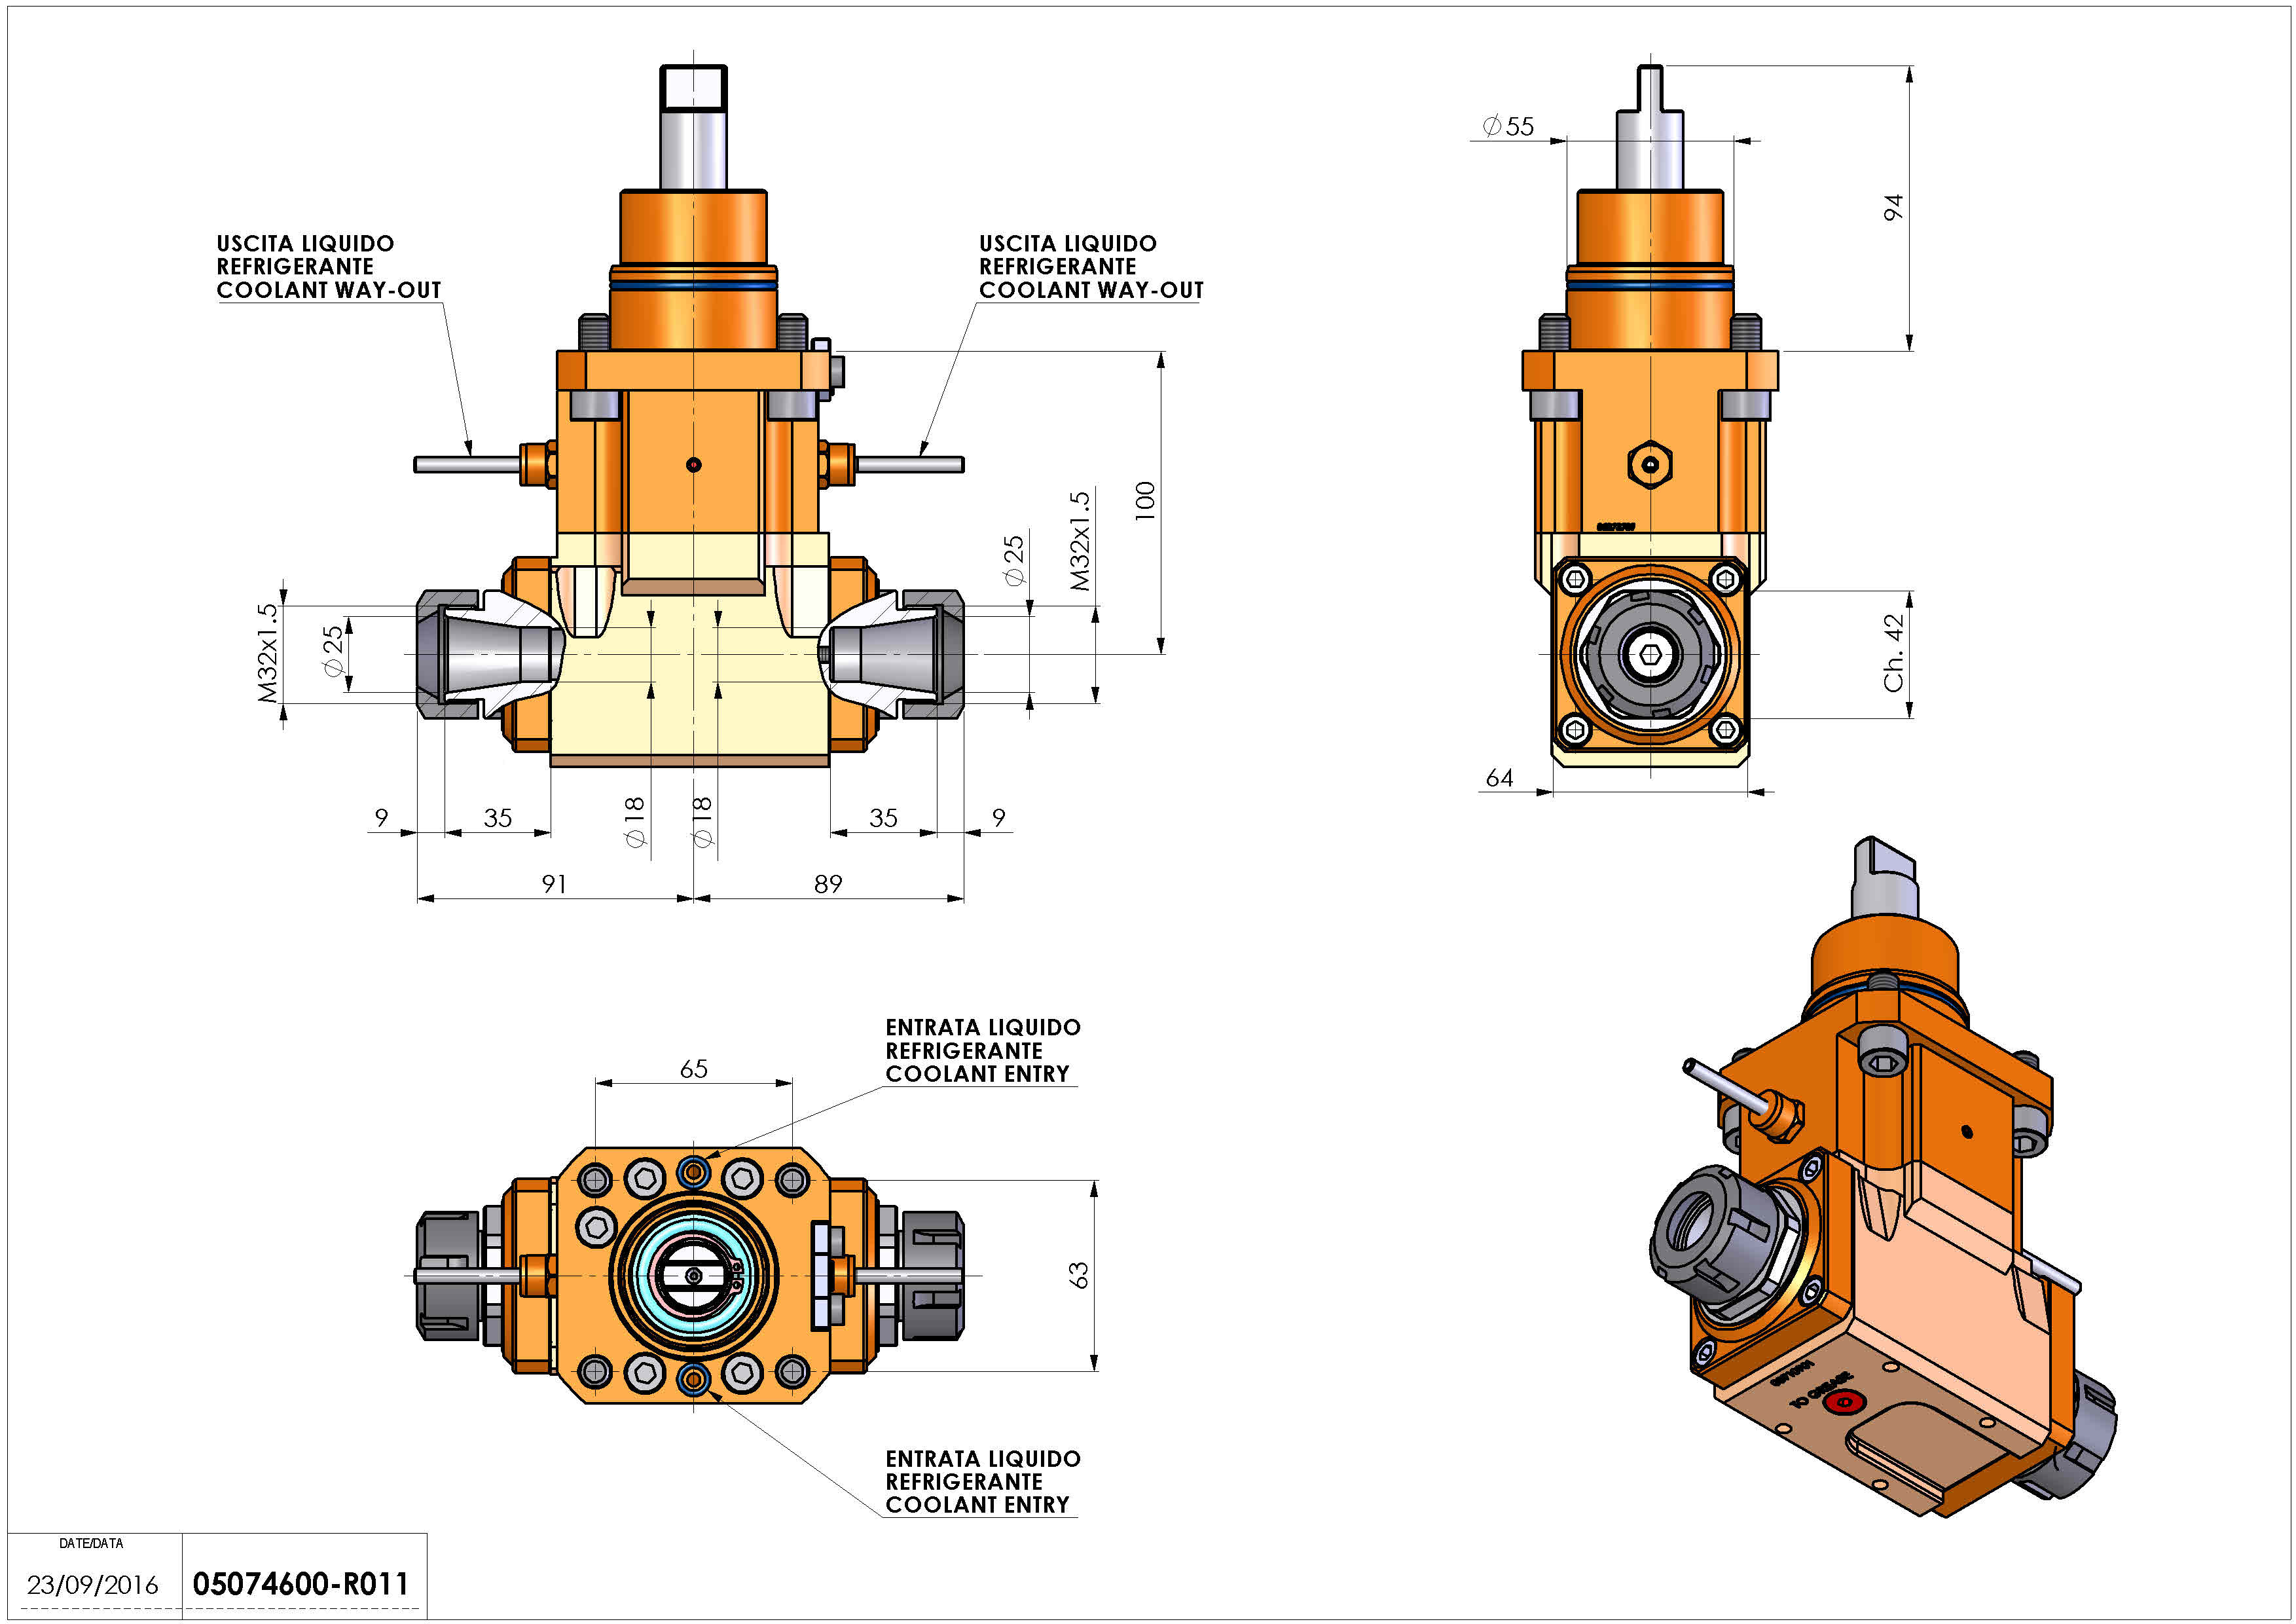 Technical image - LT-A D55 ER25-25 H100 BI.